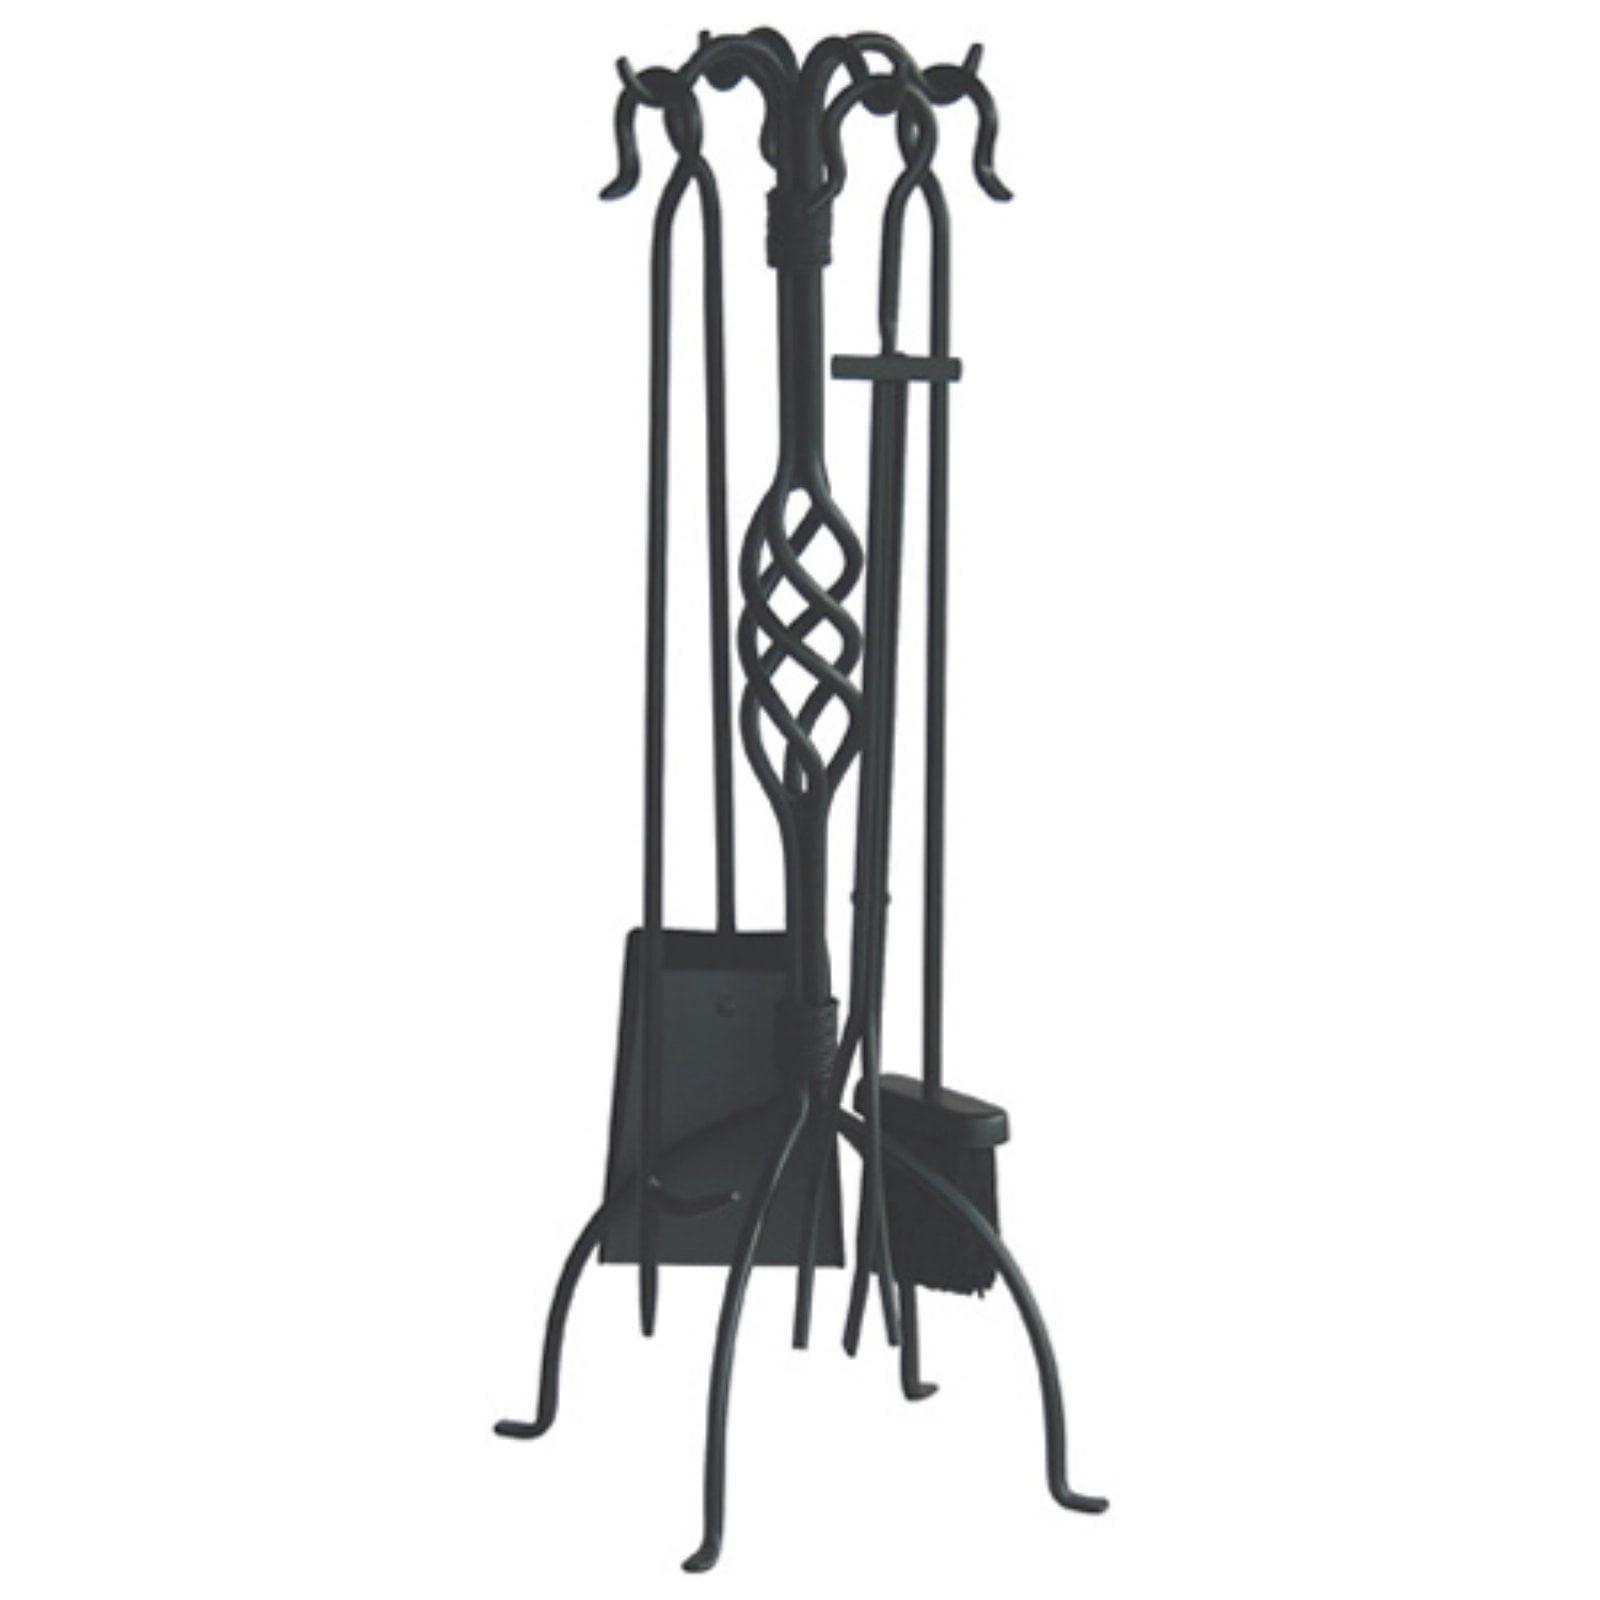 Uniflame Wrought Iron Fireplace Tool Set, Black Finish, 5-Piece ...